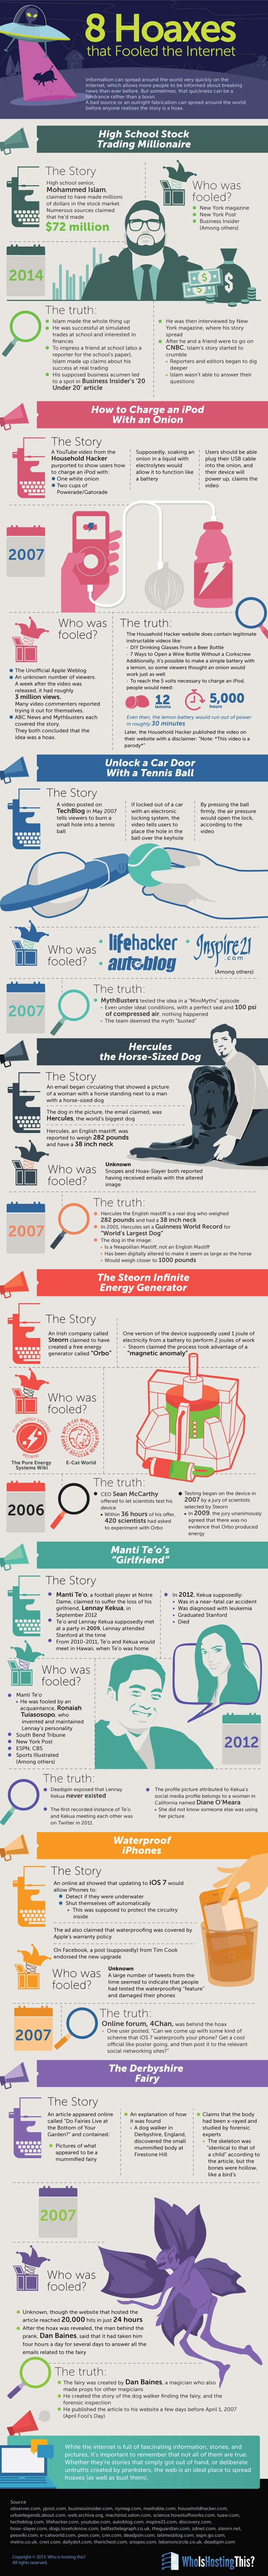 internet-hoaxes Infographie : 8 canulars qui ont dupé Internet